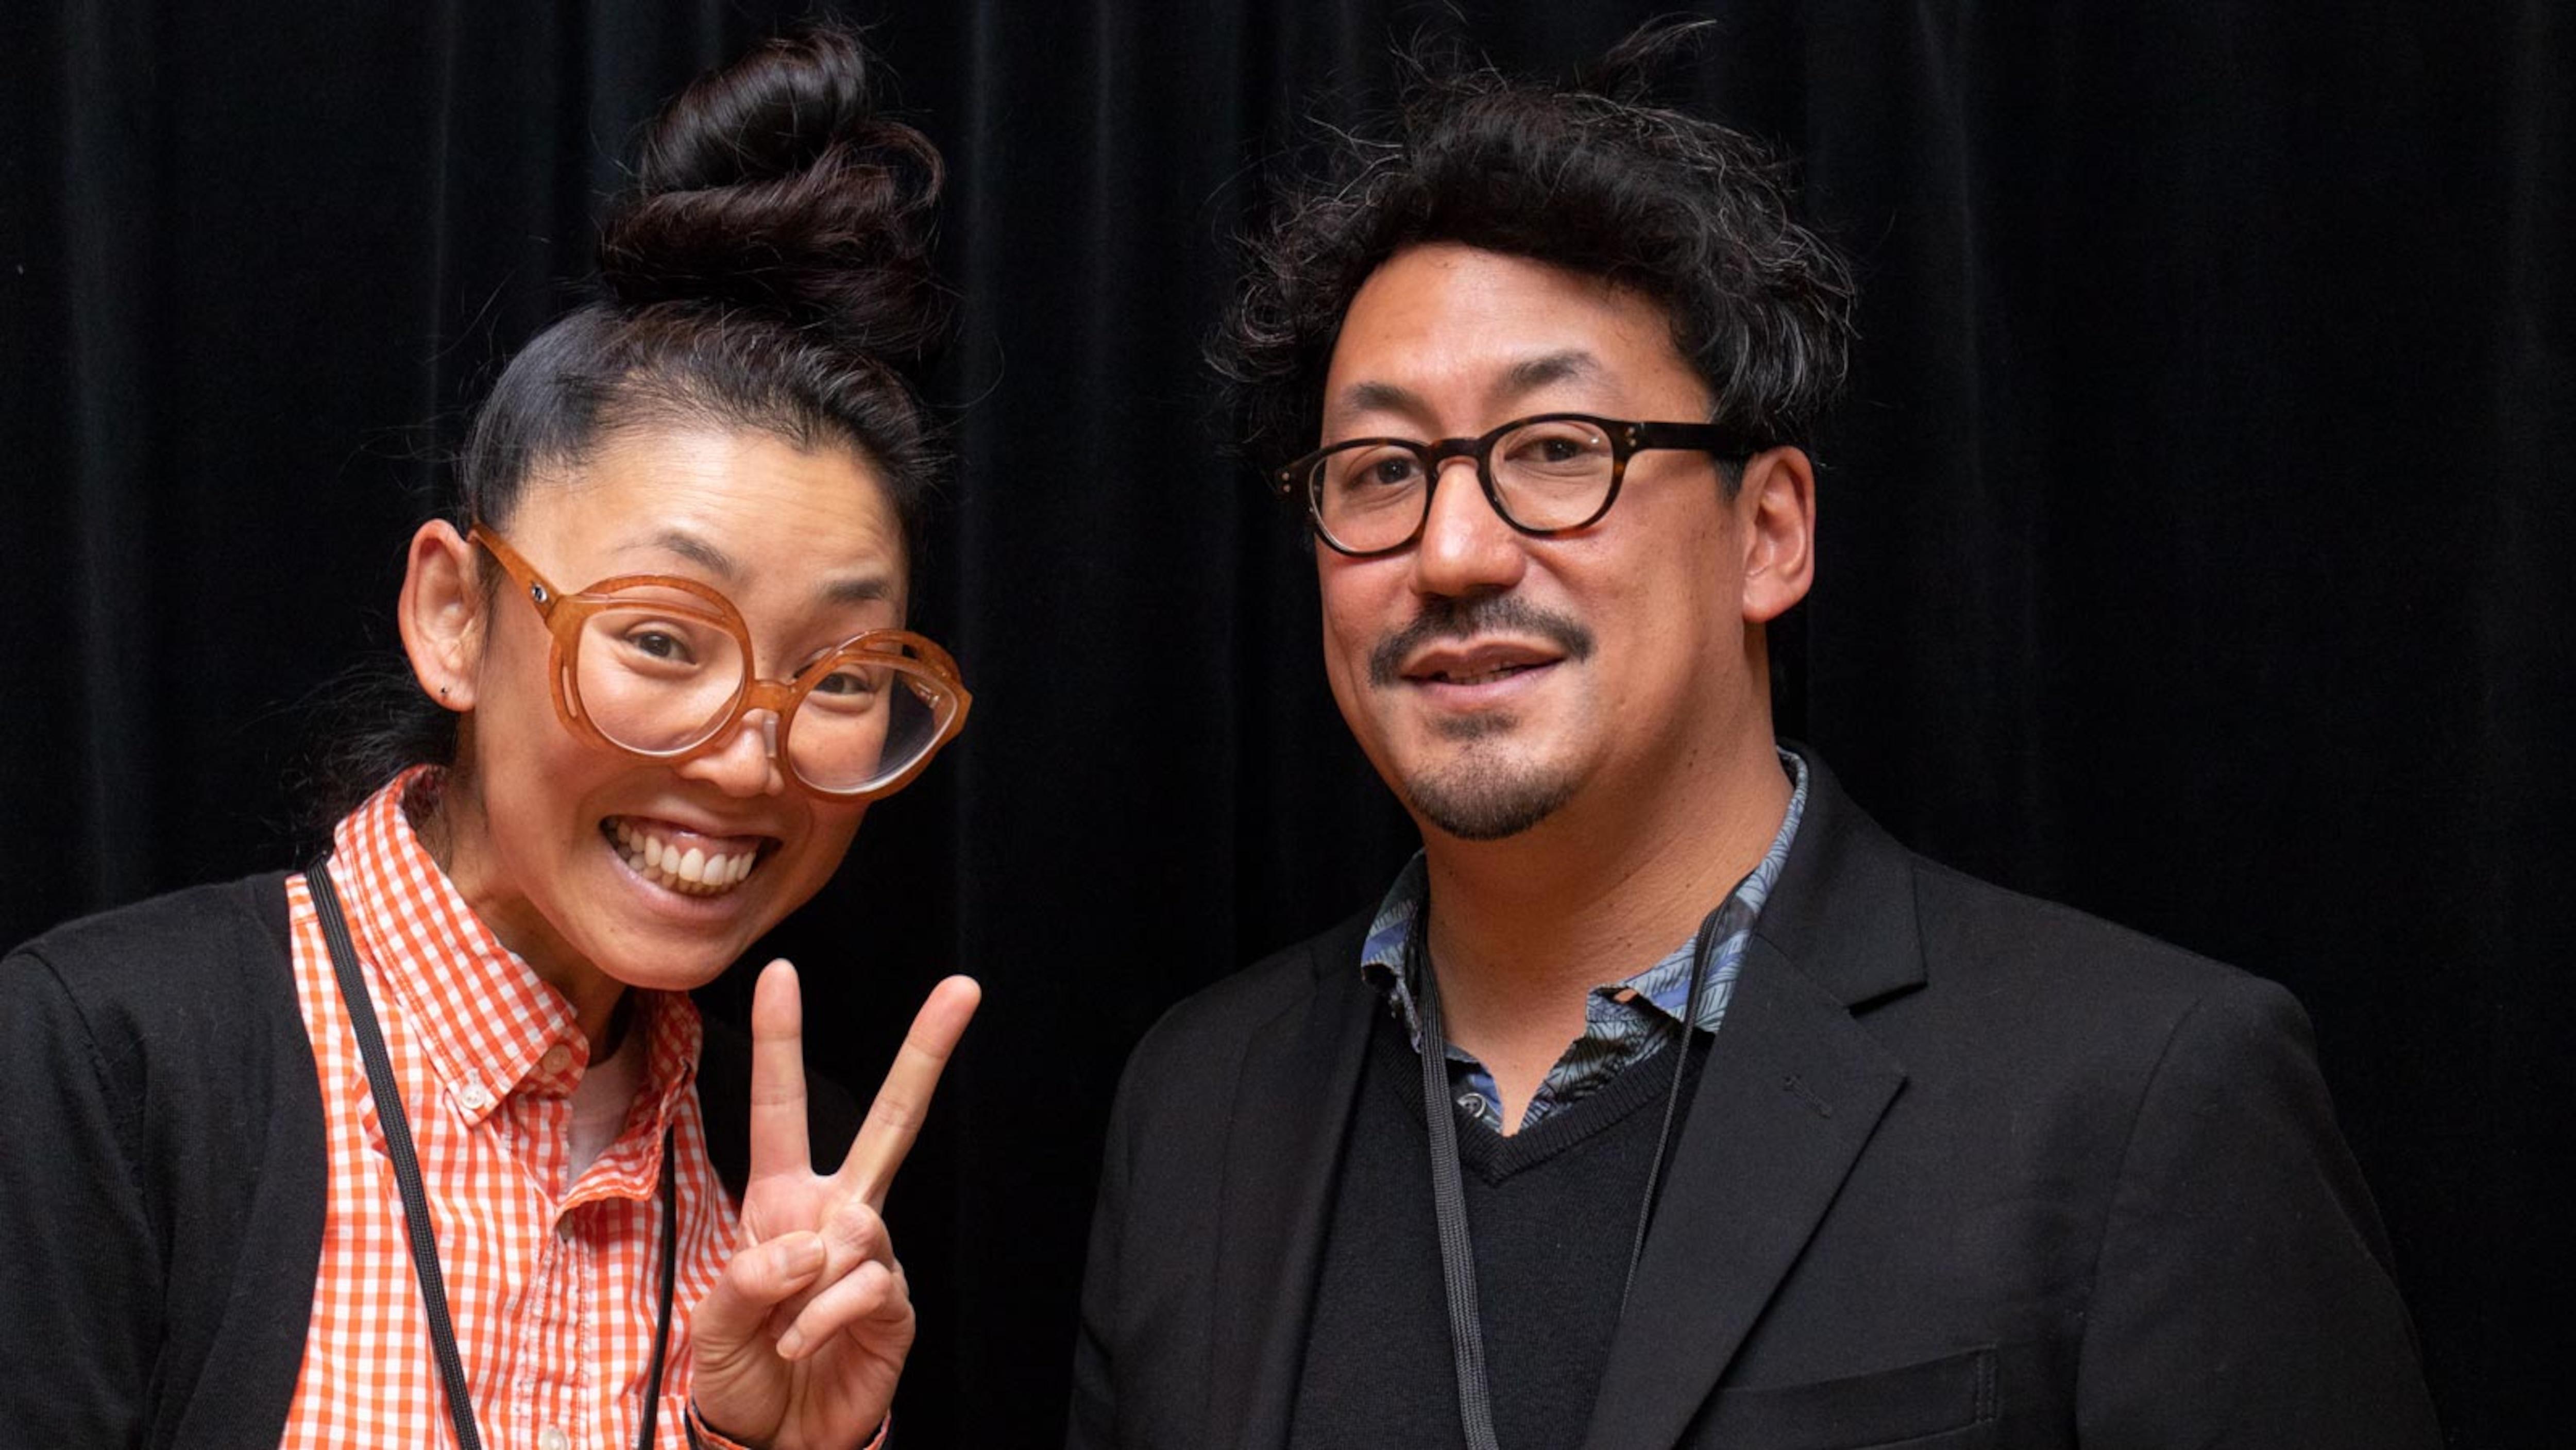 Maya Kuroki (chanteuse) et Jidetaka Yoneyama (guitariste) de la formation Teke Teke,